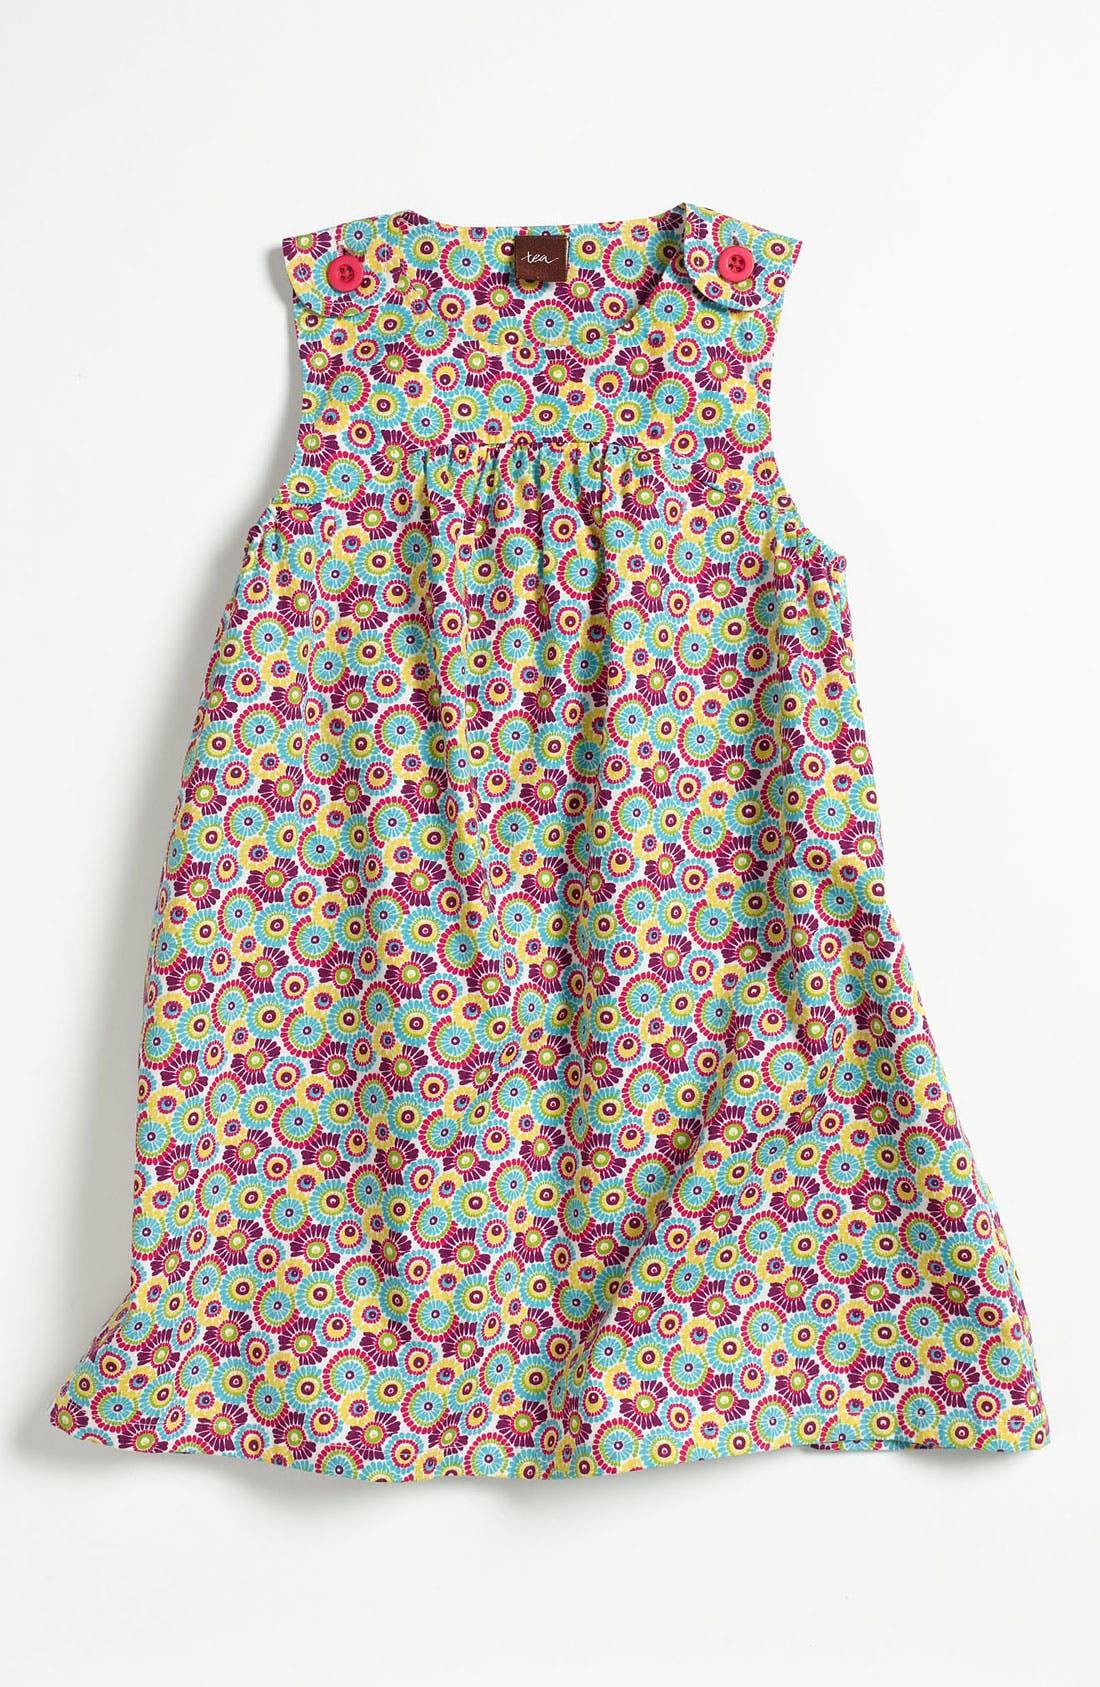 Alternate Image 1 Selected - Tea Collection 'Cactus Flower' Dress (Toddler, Little Girls & Big Girls)